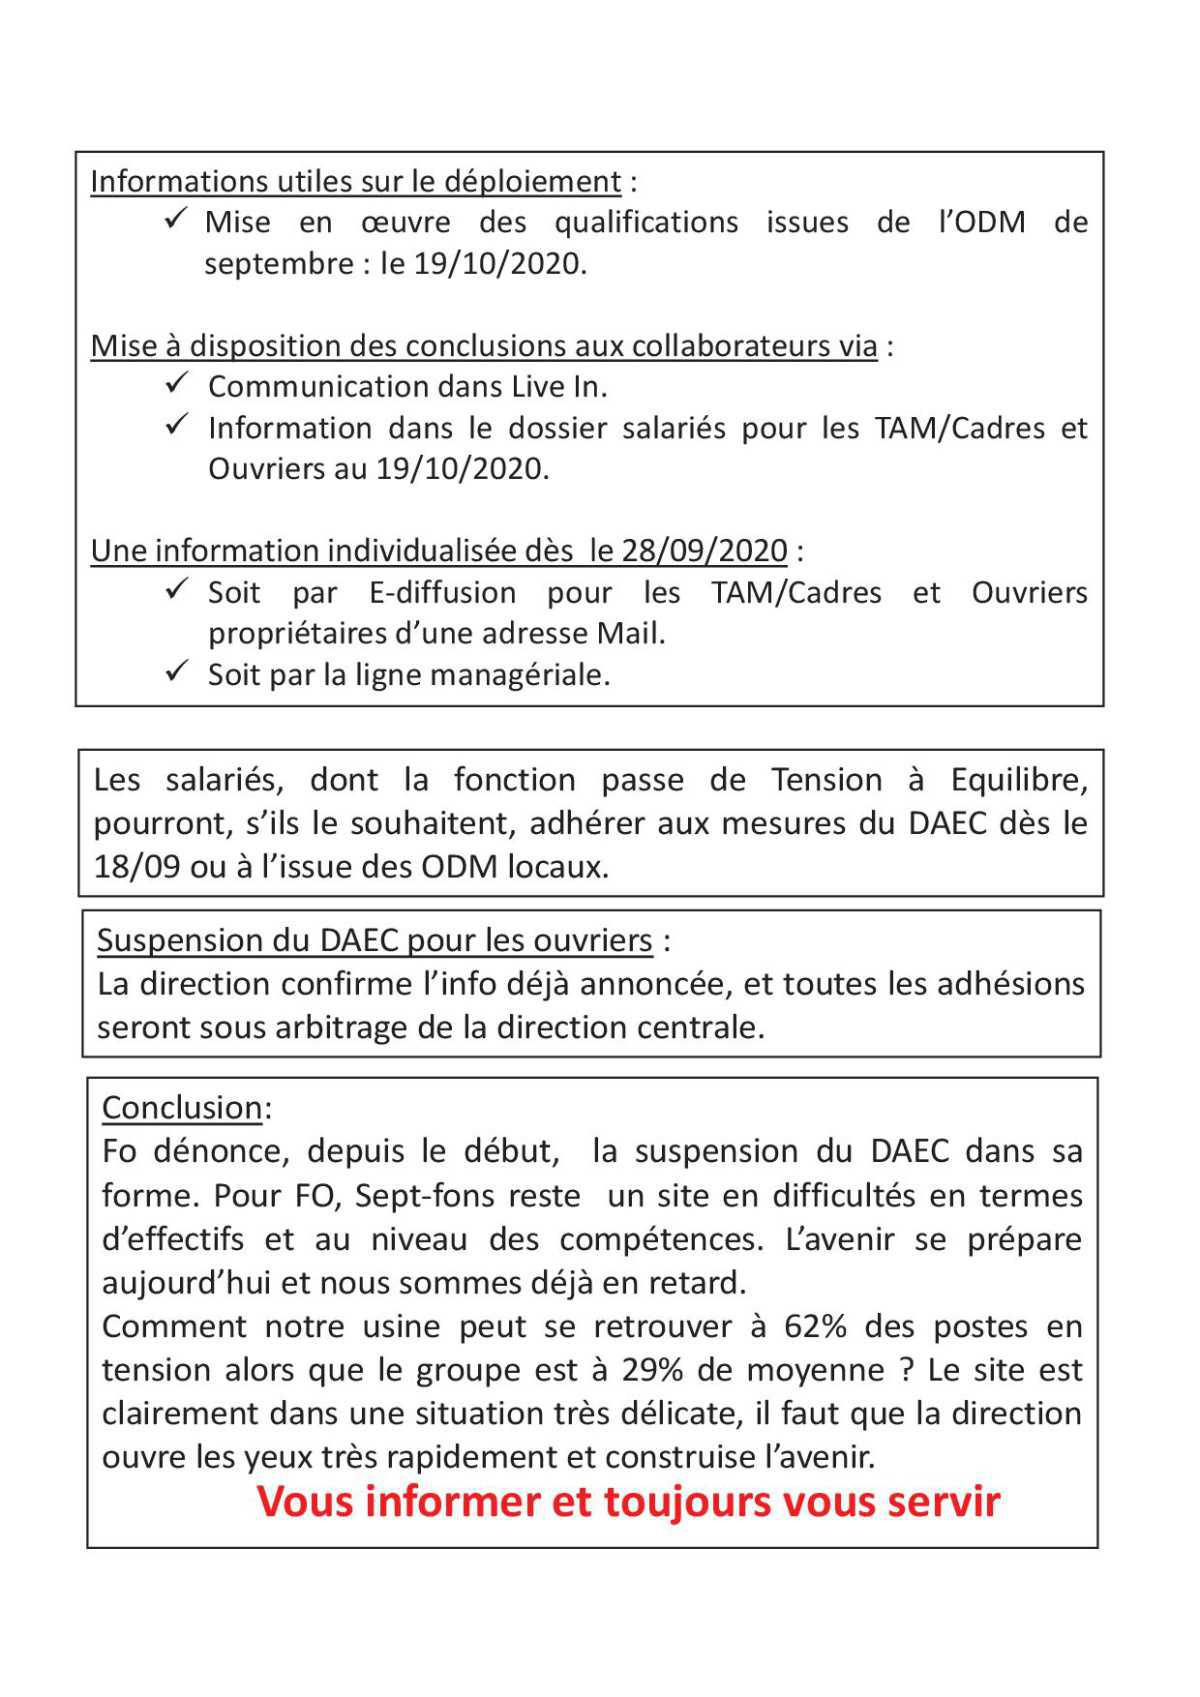 Compte Rendu CSE extra 24 septembre 2020